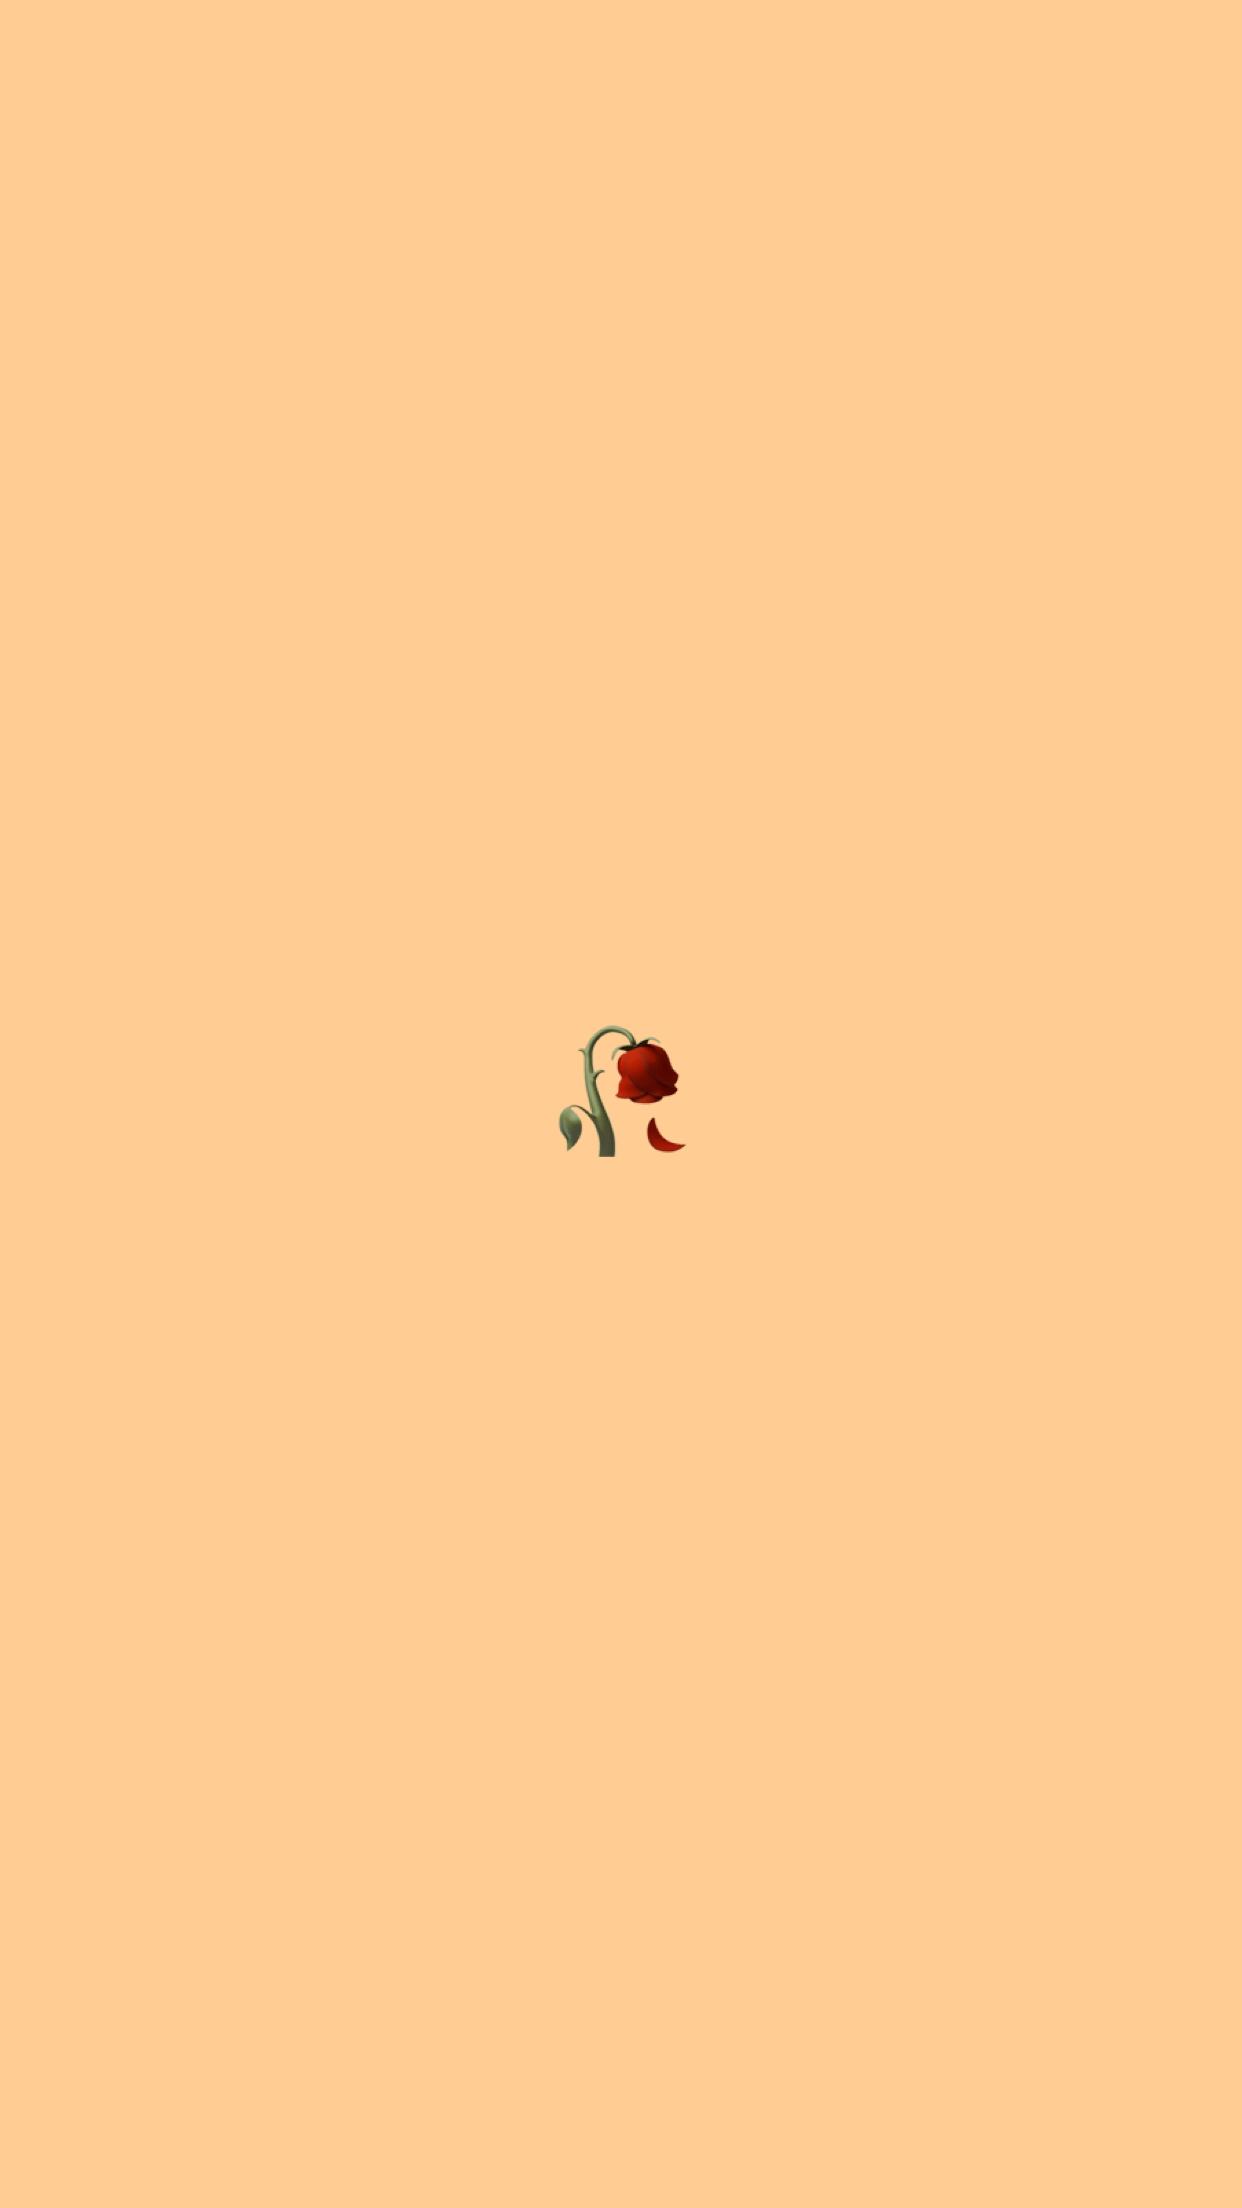 Gambar Aesthetic Sad Kartun Dunia Gambar